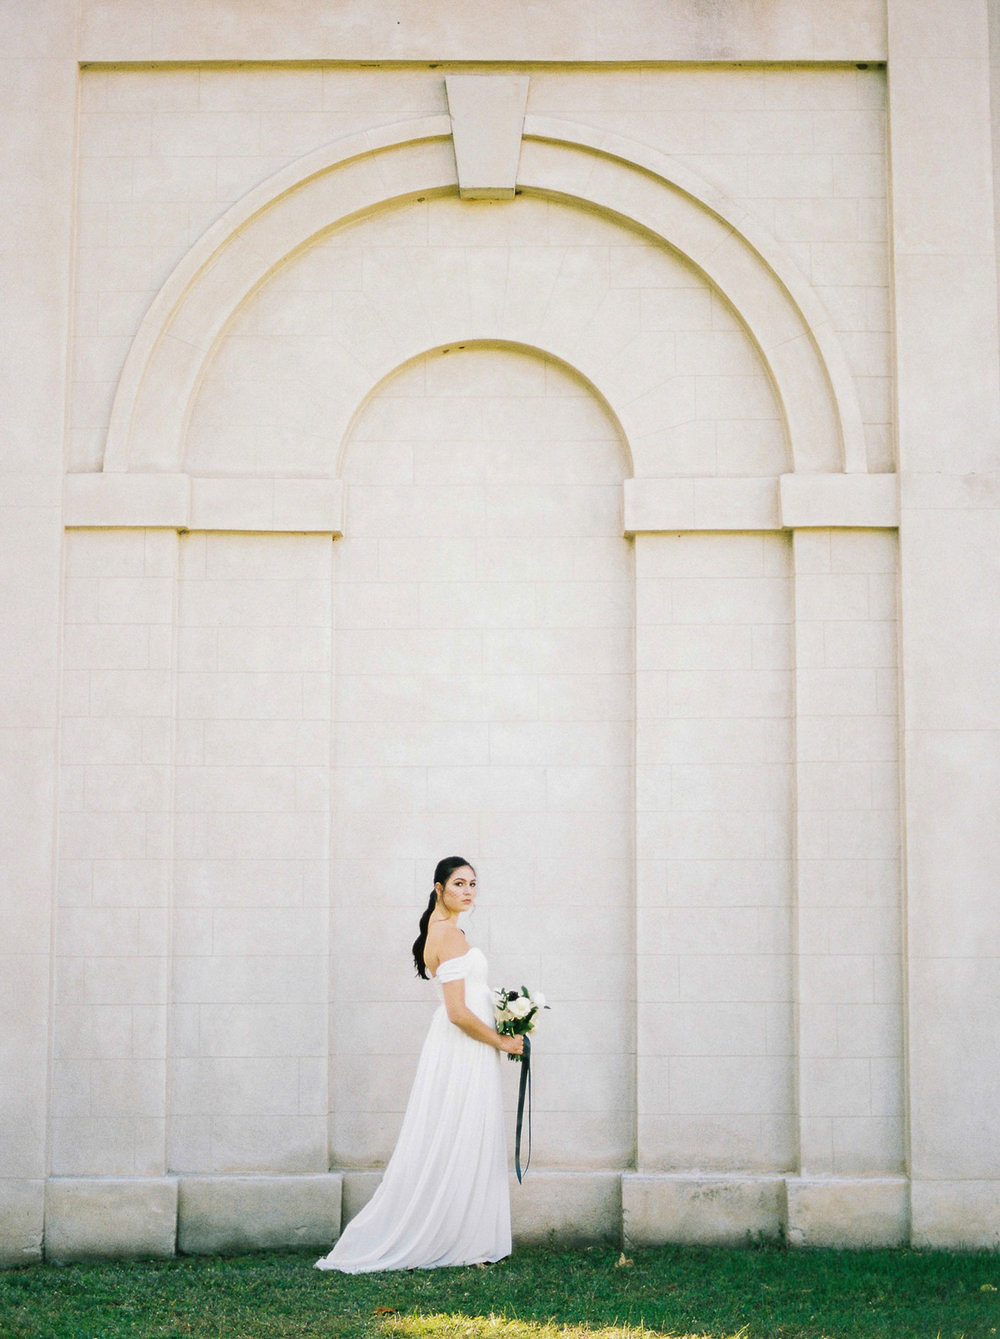 kurtz-orpia-photography-vineyard-bride-swish-list-dundurn-castle-dundas-wedding-editorial-1.jpg